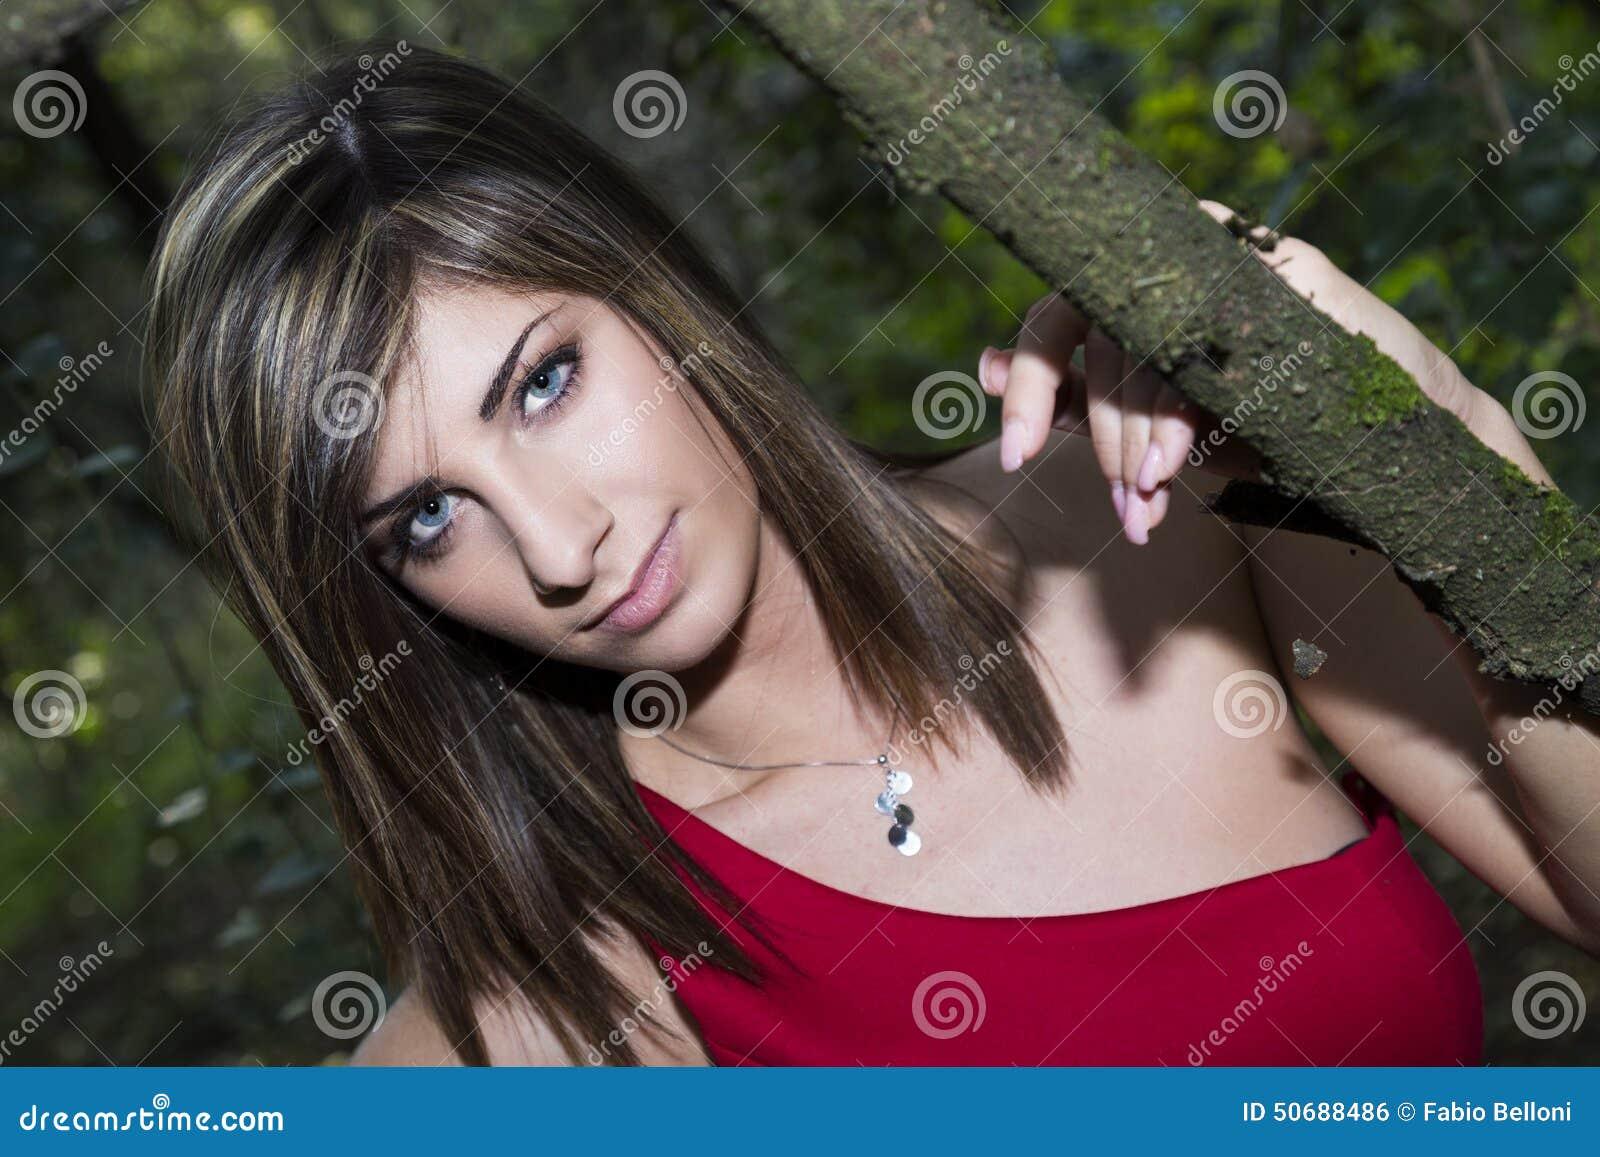 Download 高雅在森林里 库存照片. 图片 包括有 beautifuler, 可爱, 摆在, 新鲜, 女性, 构成, beauvoir - 50688486